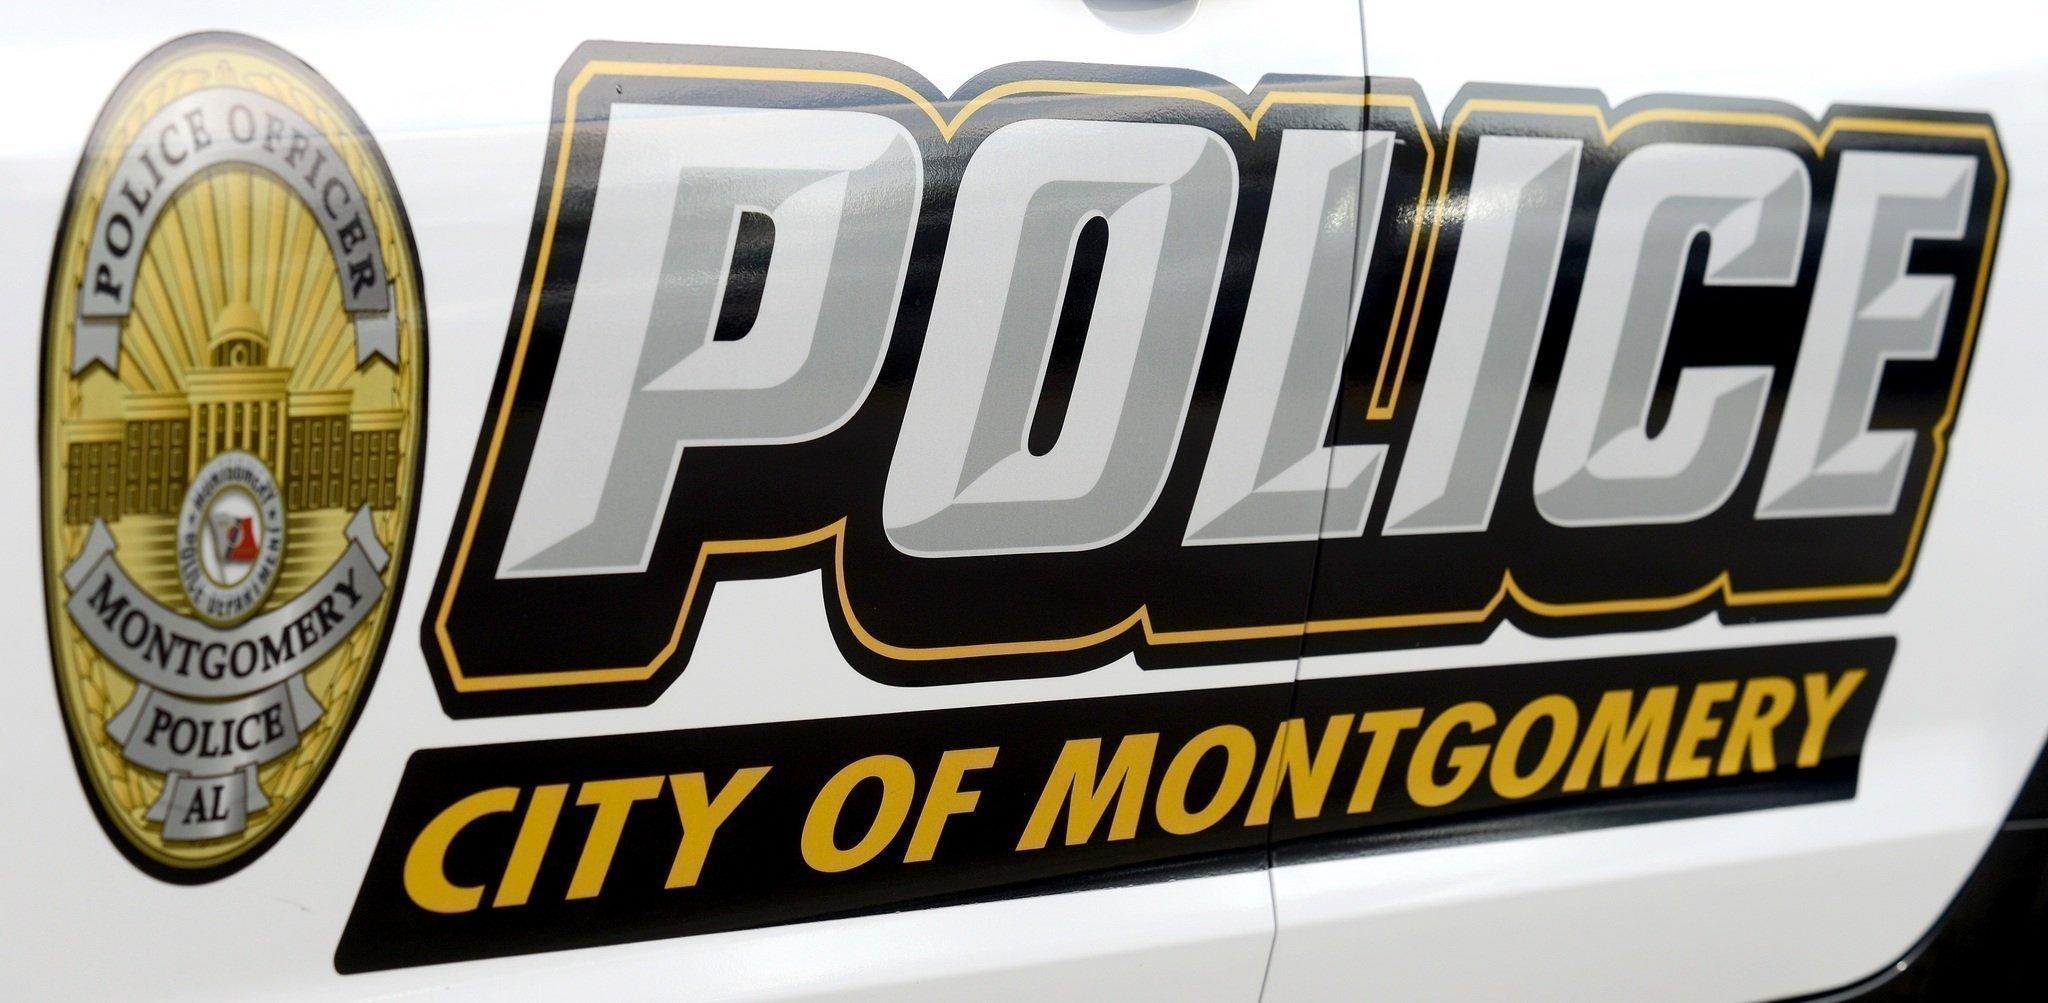 man found shot to death tuesda kitchen remodeling montgomery al Montgomery Police car